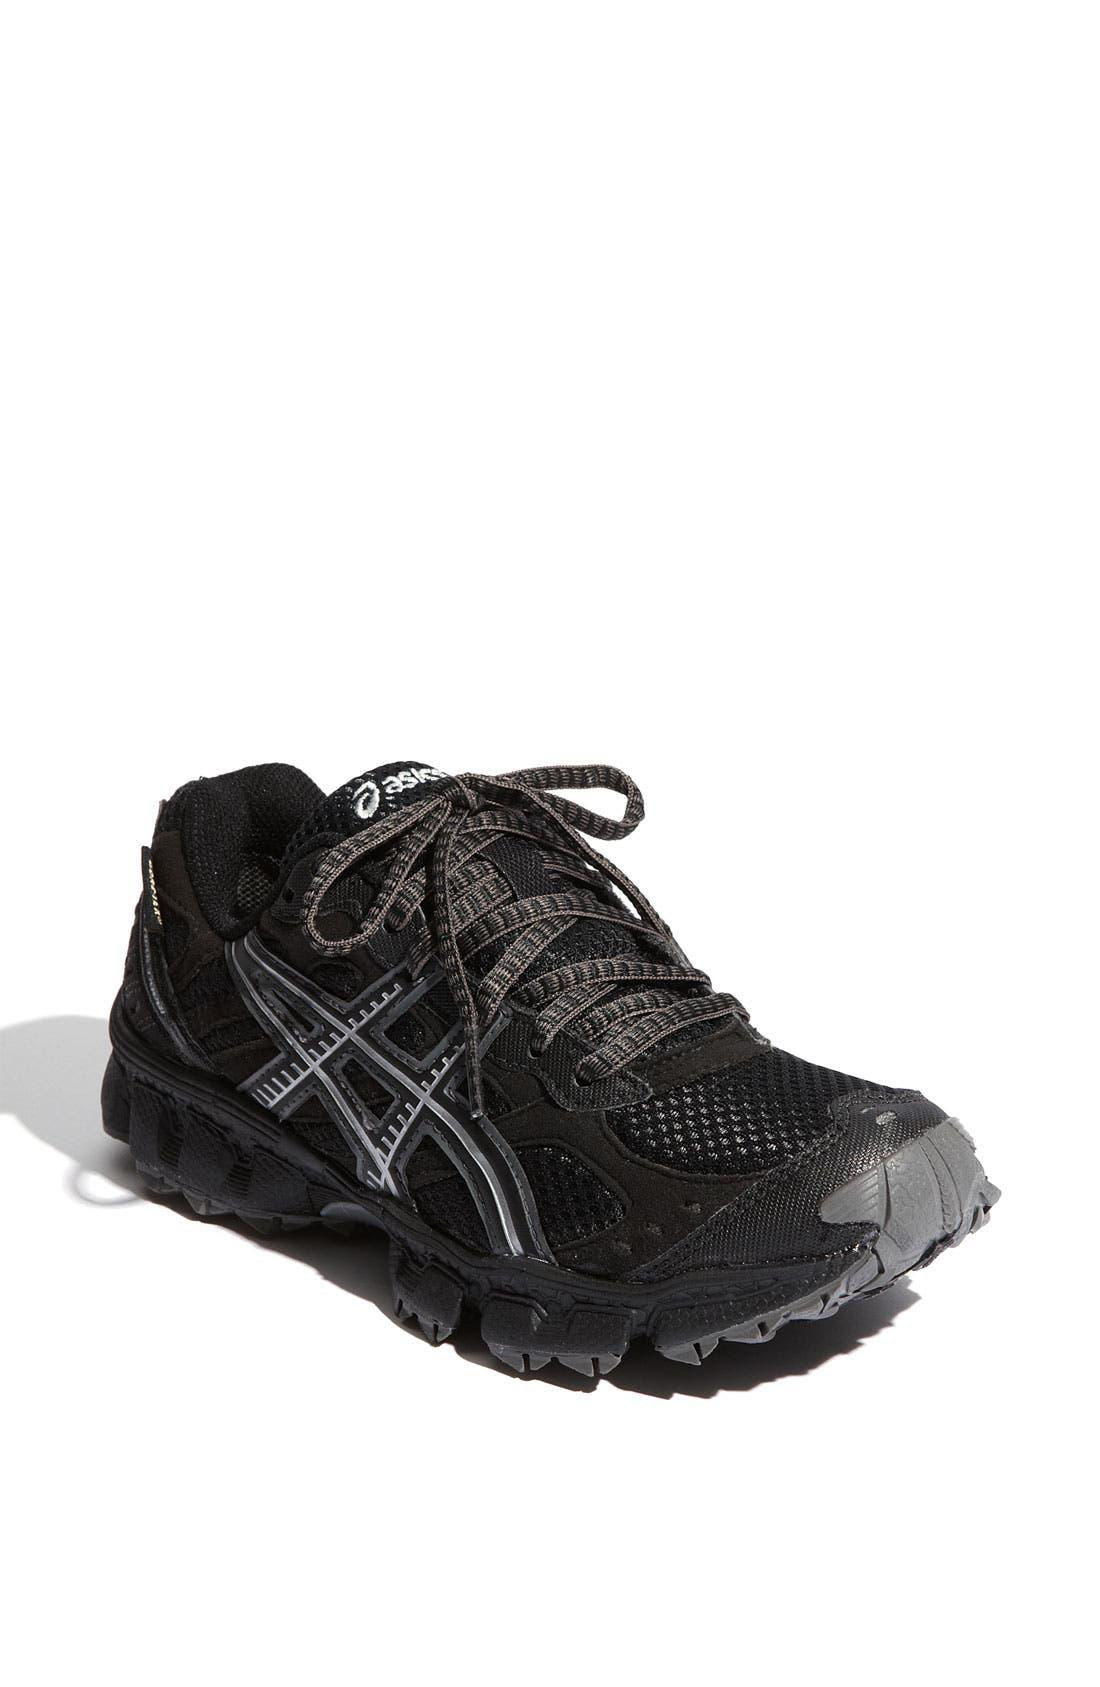 Alternate Image 1 Selected - ASICS® 'GEL Trail-Lahar 3' Trail Running Shoe (Women)